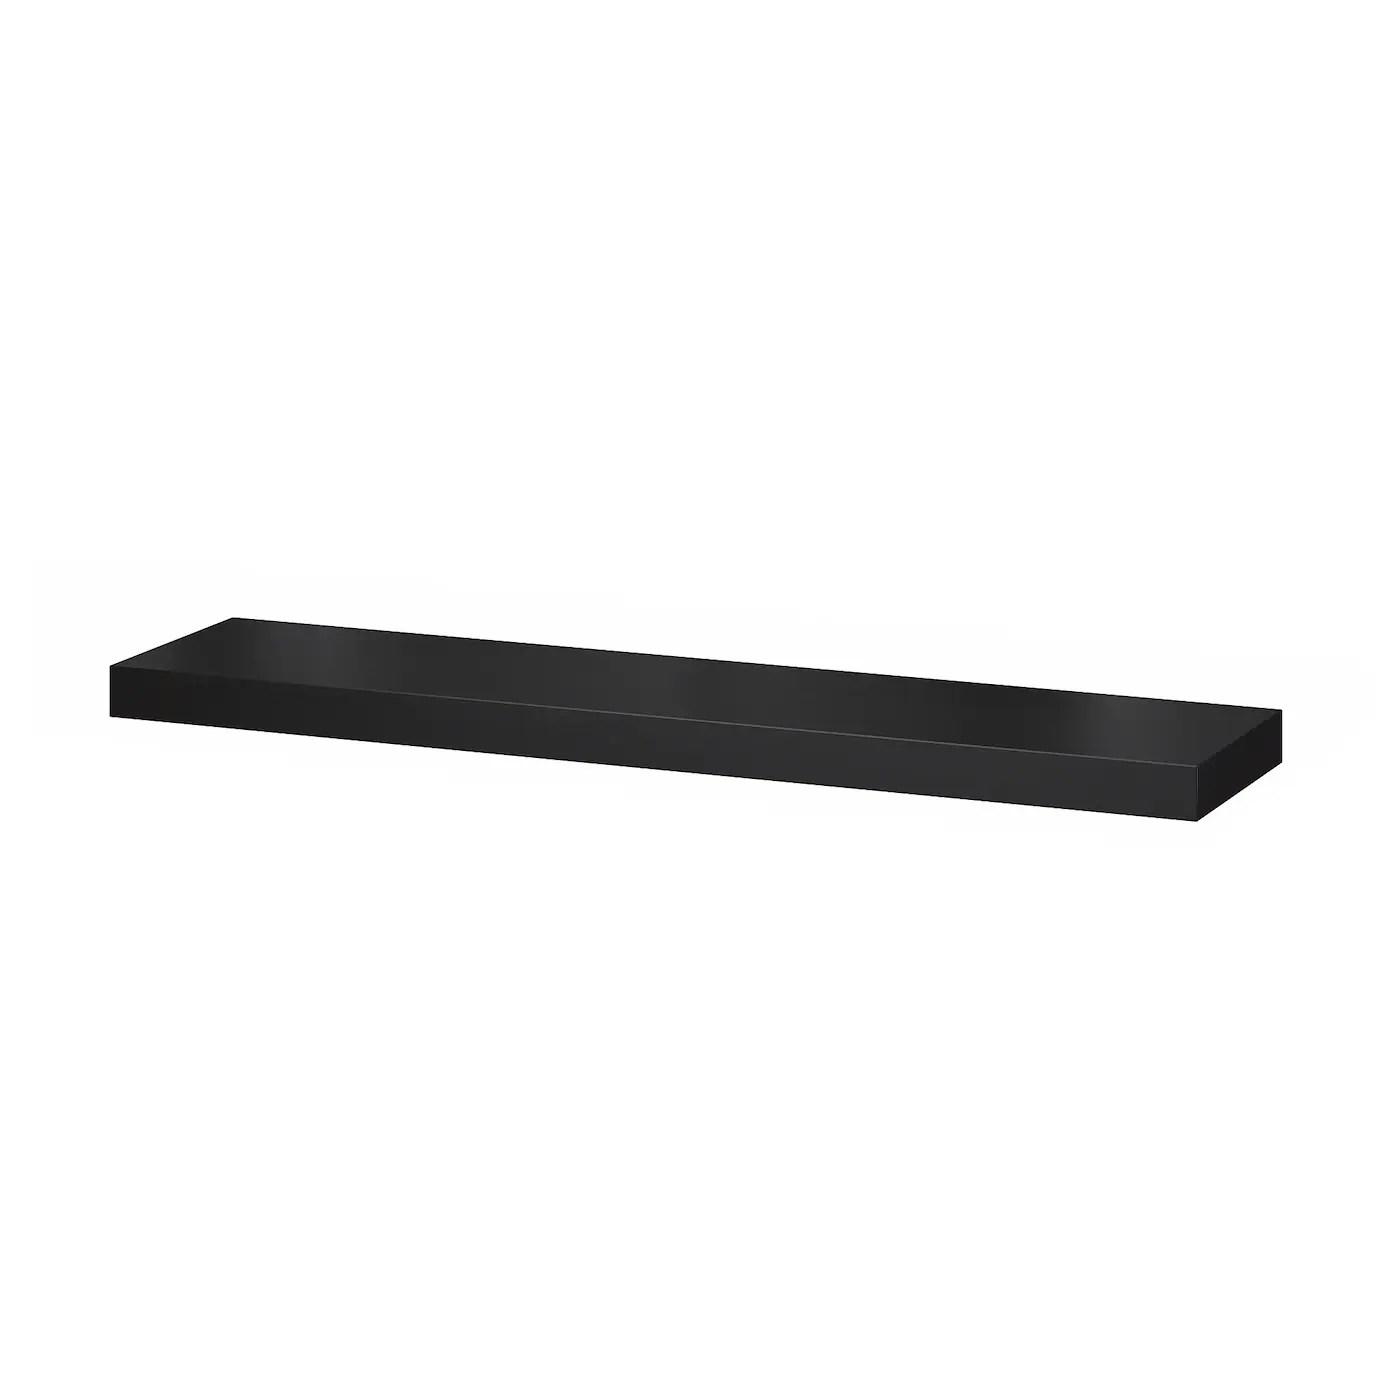 etagere ikea lack noir. Black Bedroom Furniture Sets. Home Design Ideas